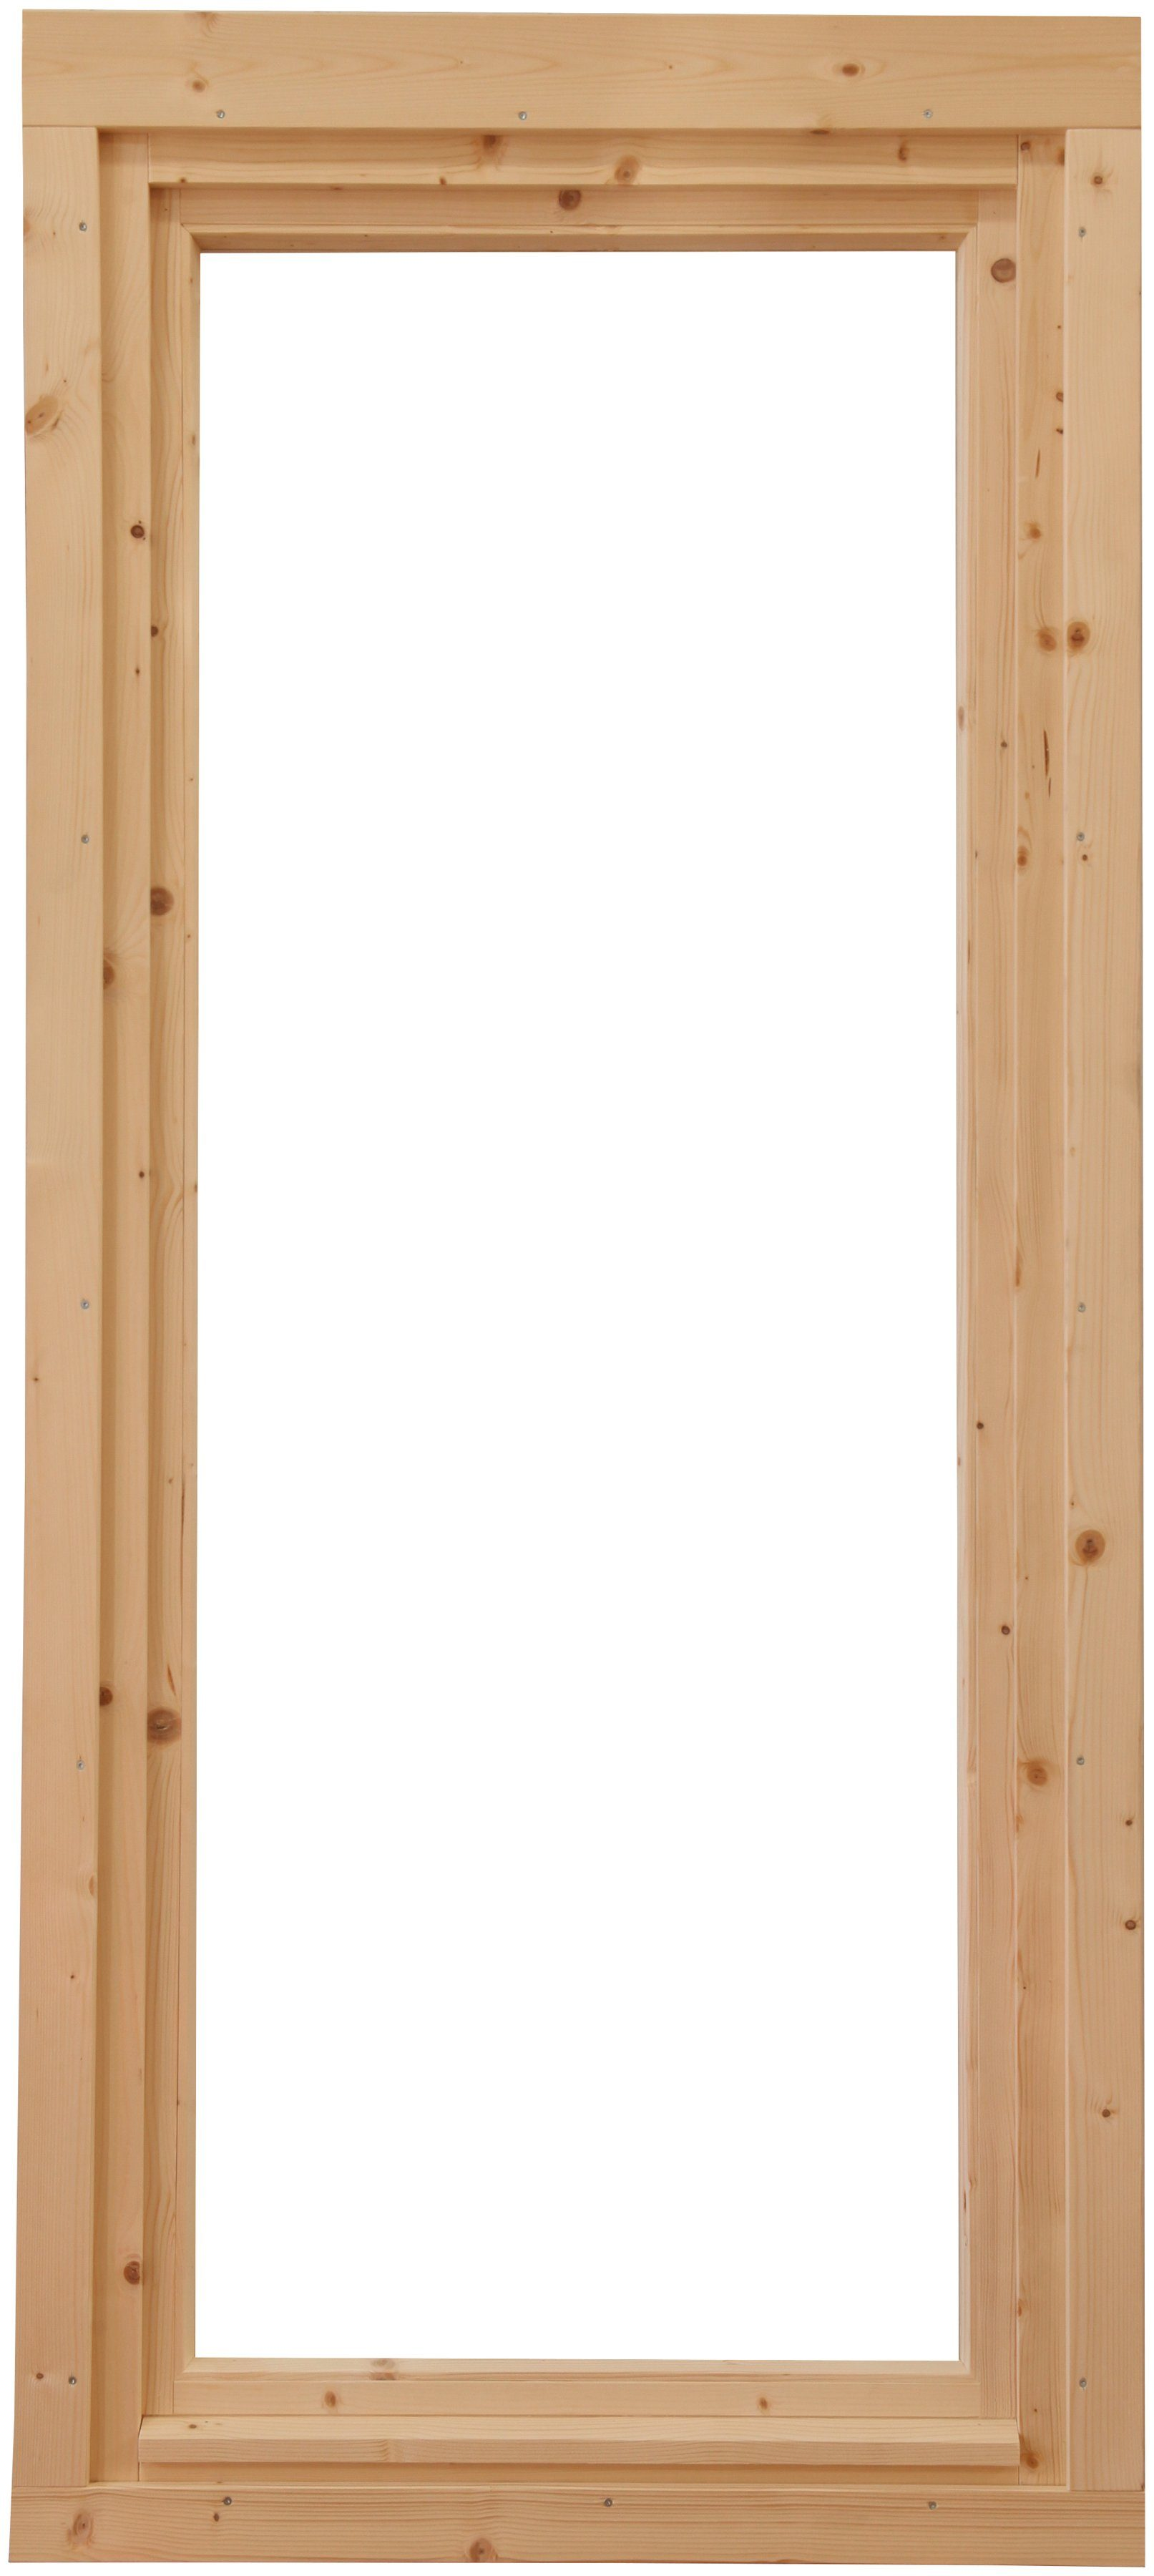 WOLFF Fenster »Helgoland Iso«, BxH: 51,5x178,4 cm